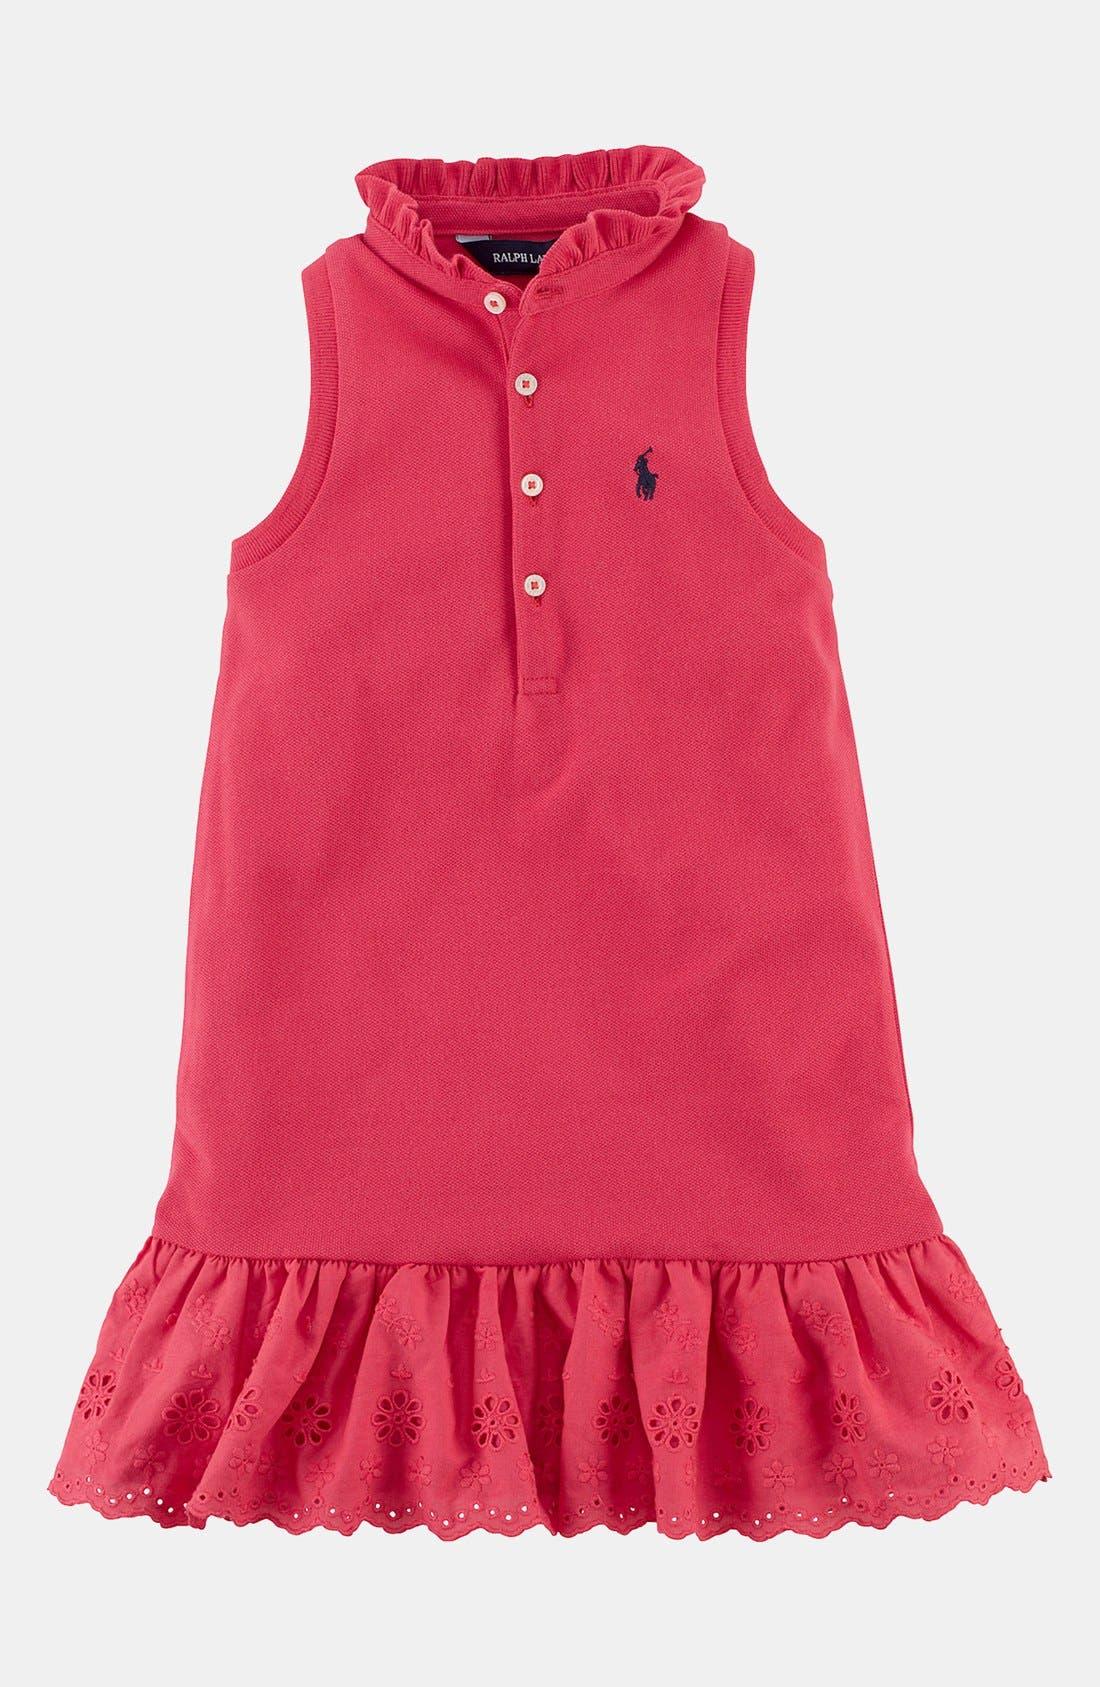 Main Image - Ralph Lauren Sleeveless Polo Dress (Toddler Girls)